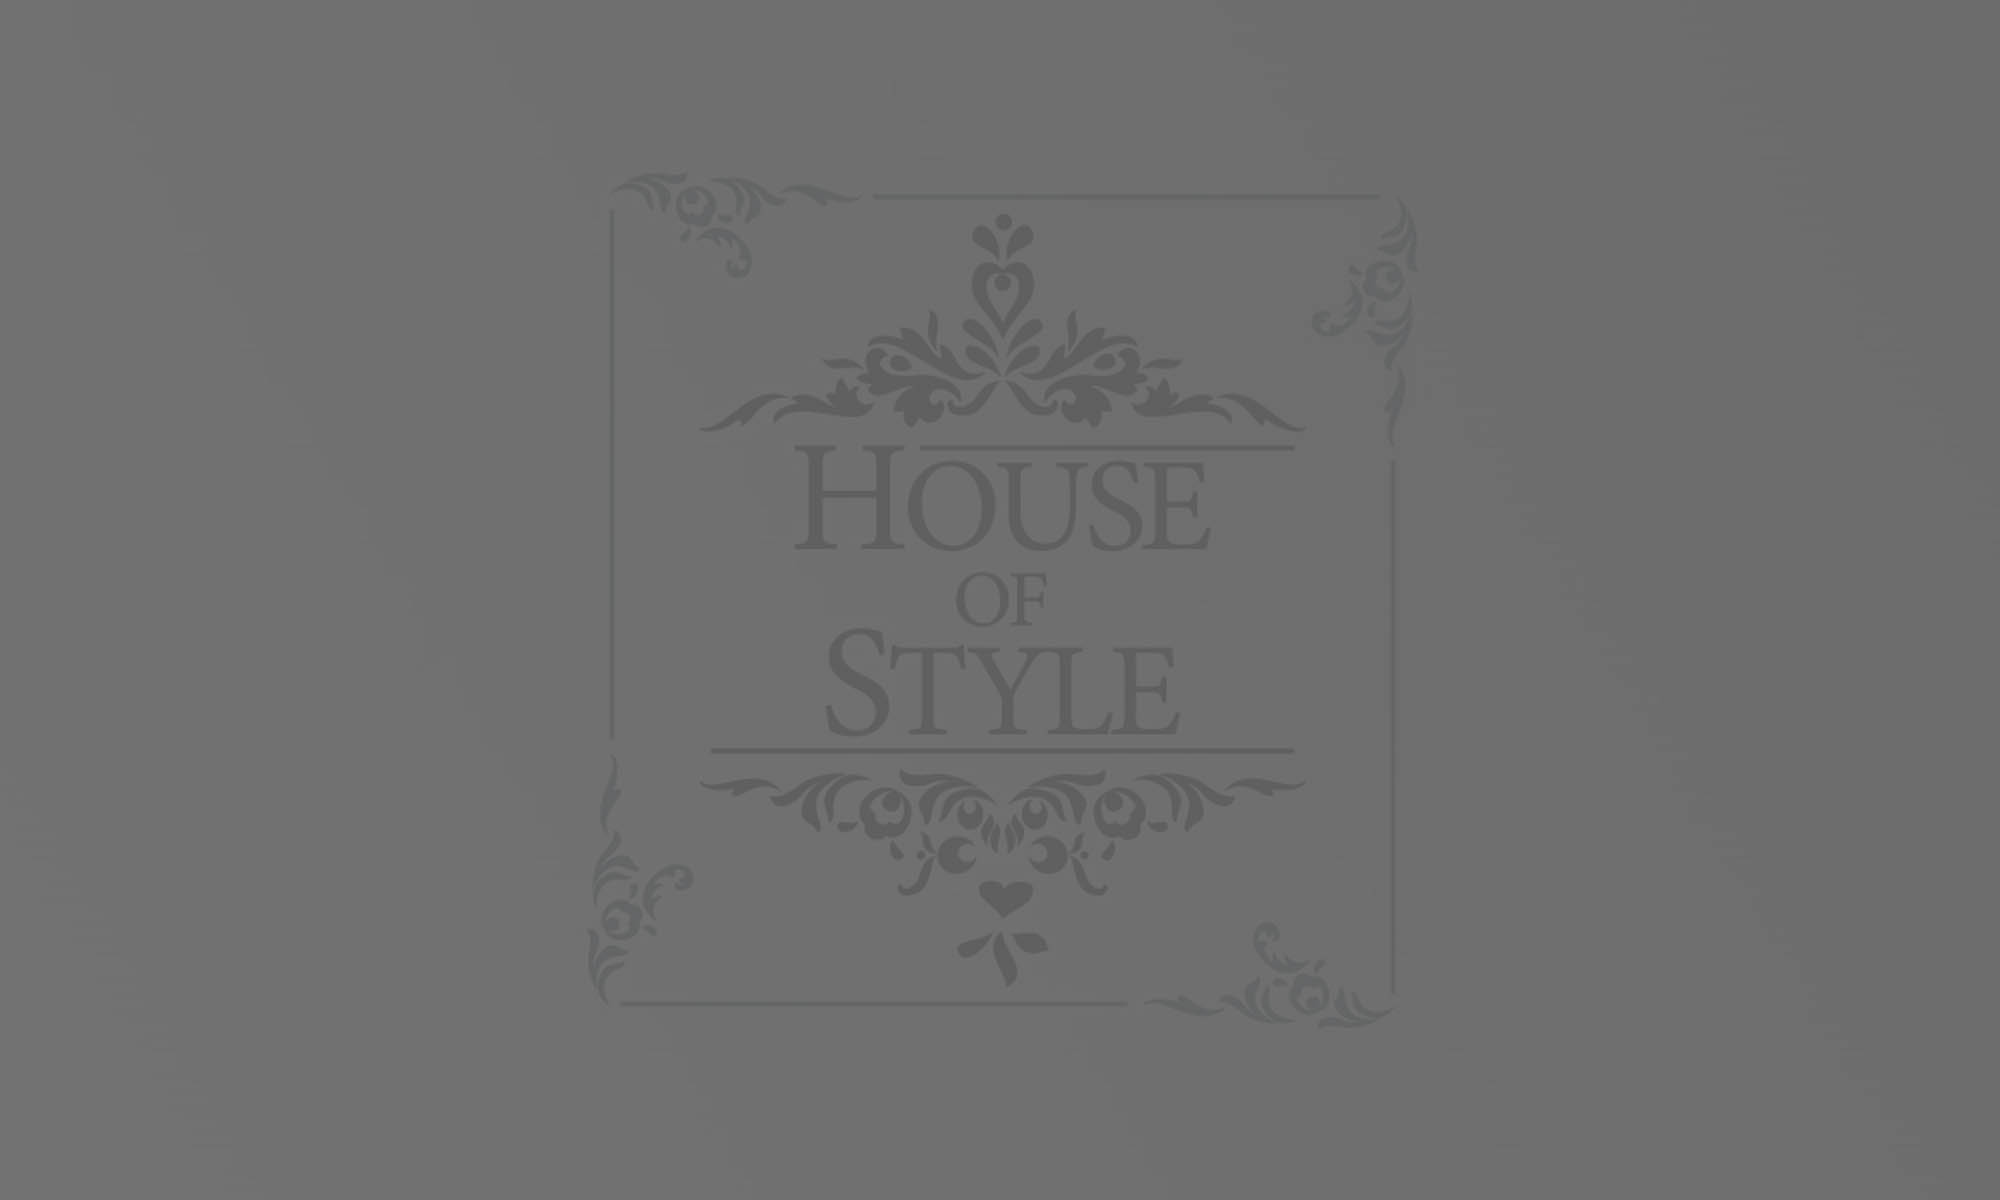 Projekt House of Style